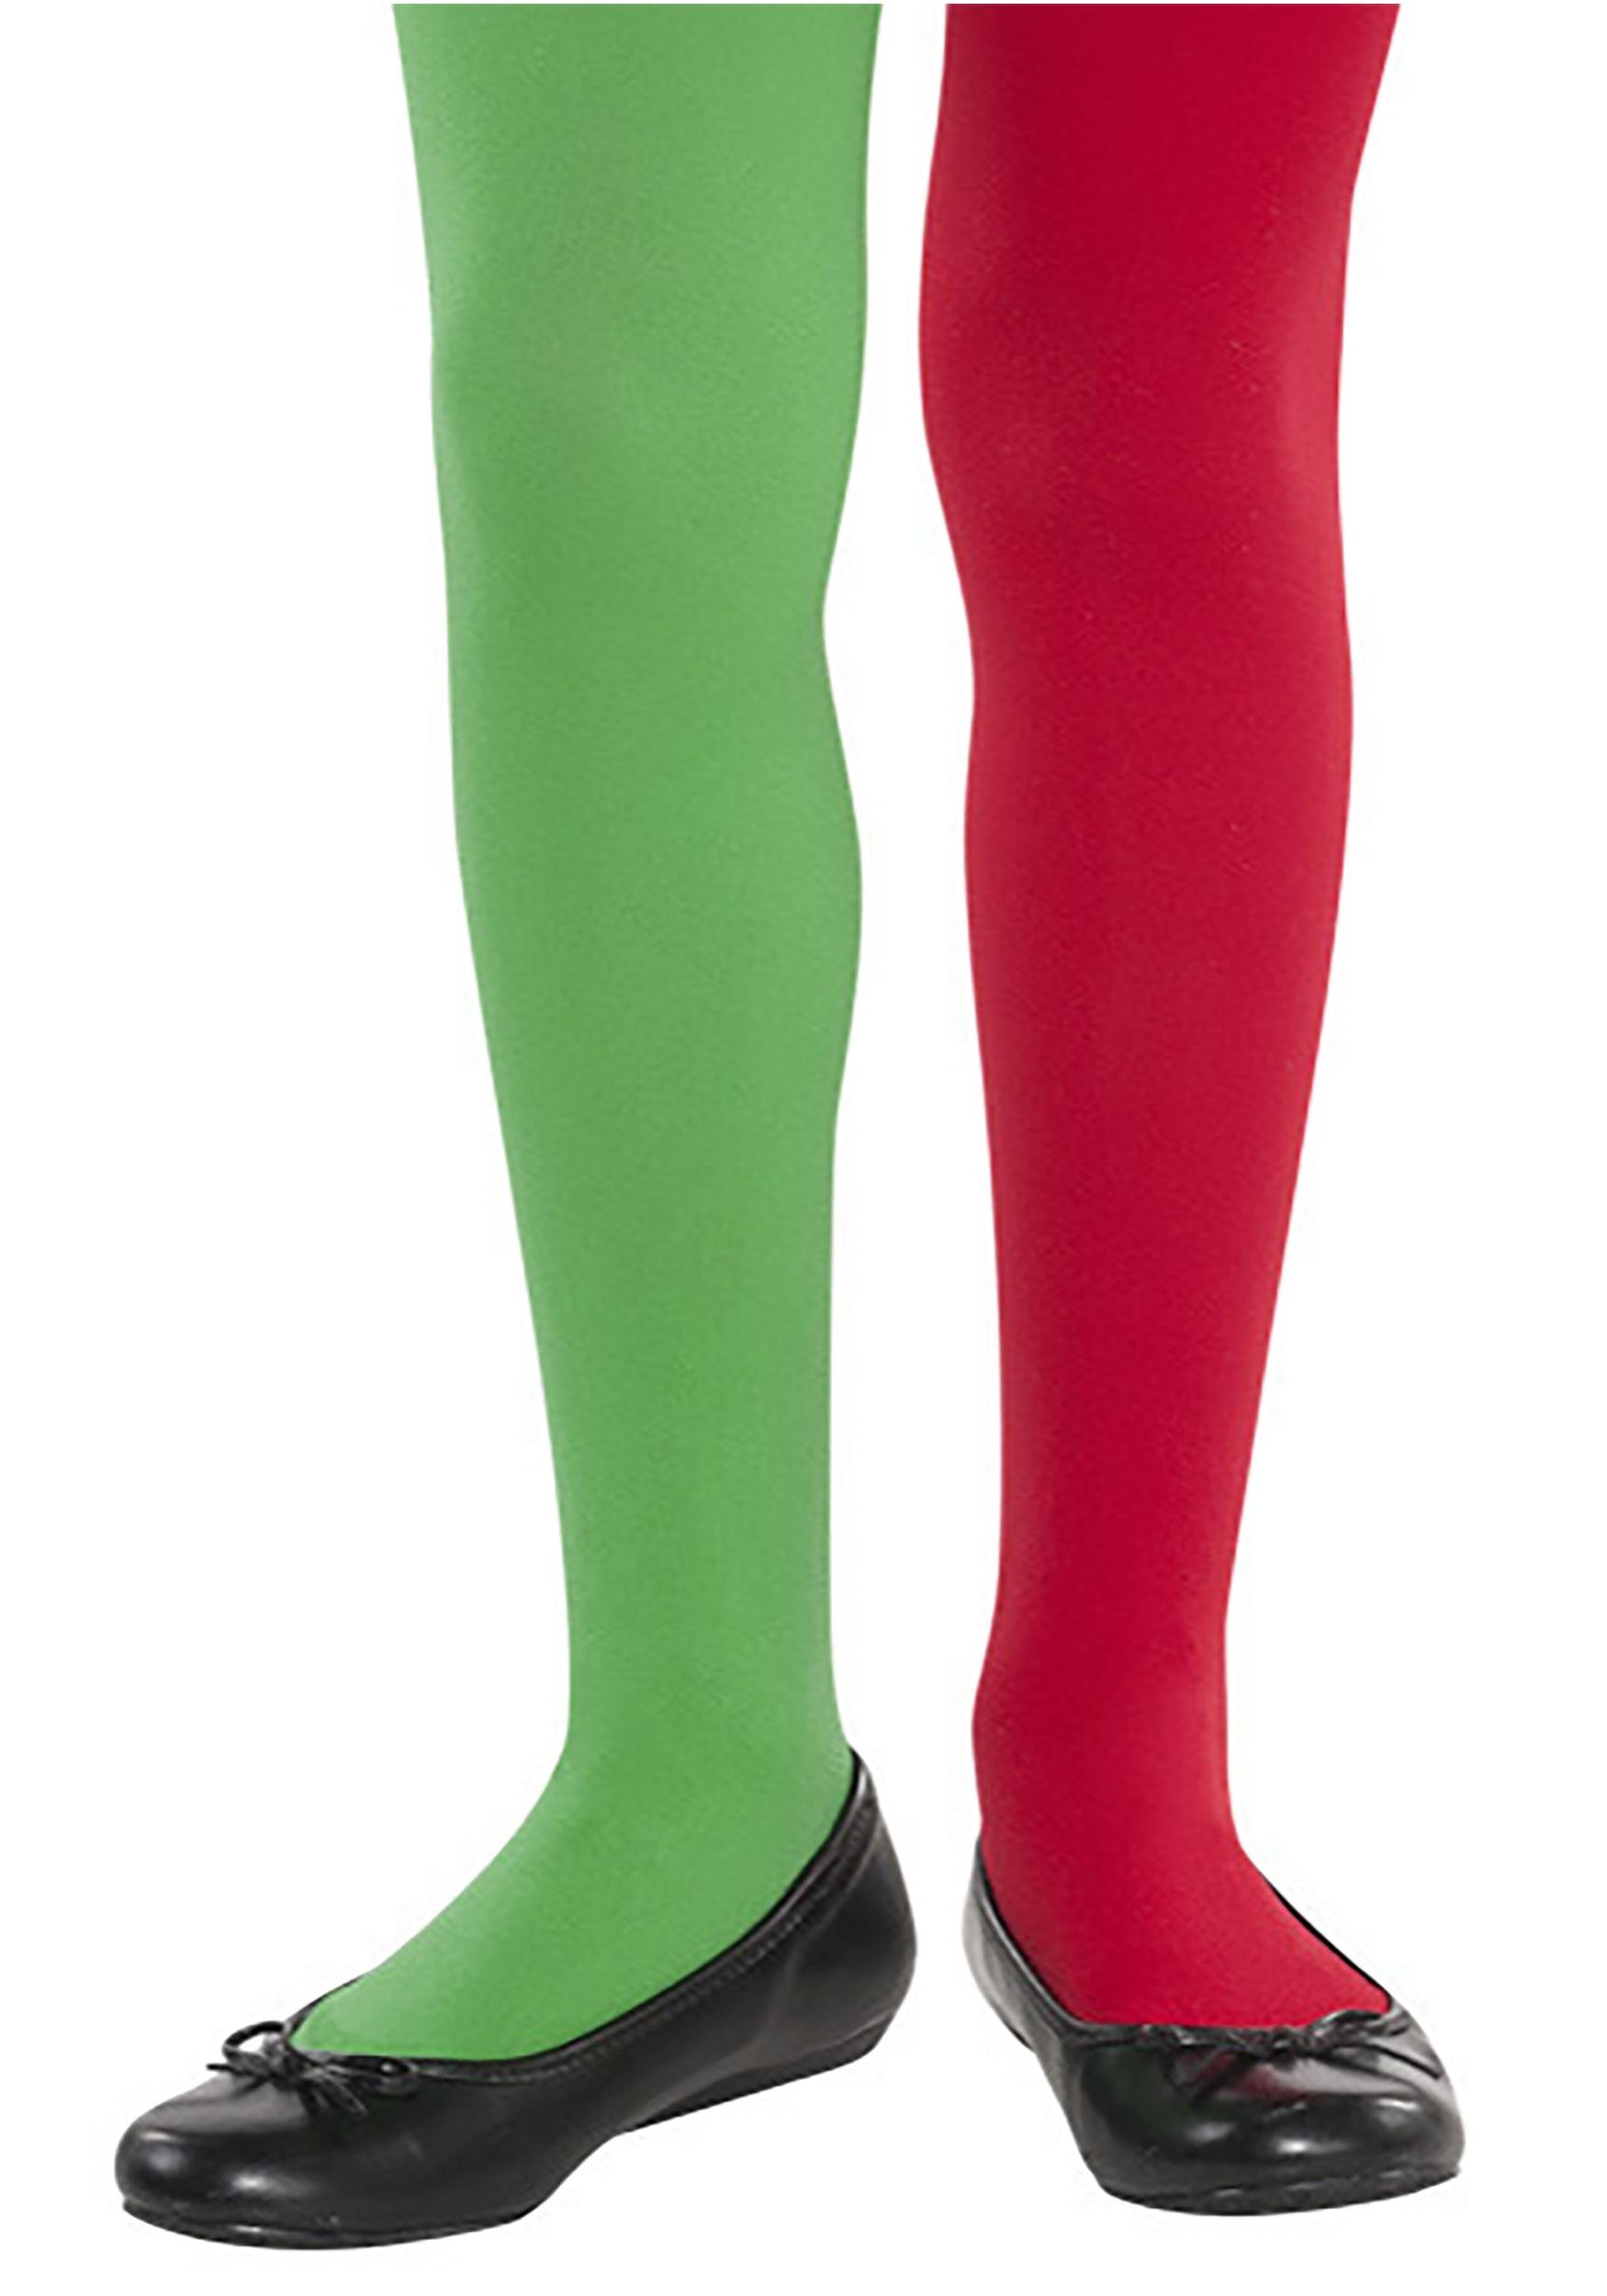 516759a4fb4 Children s Elf Tights